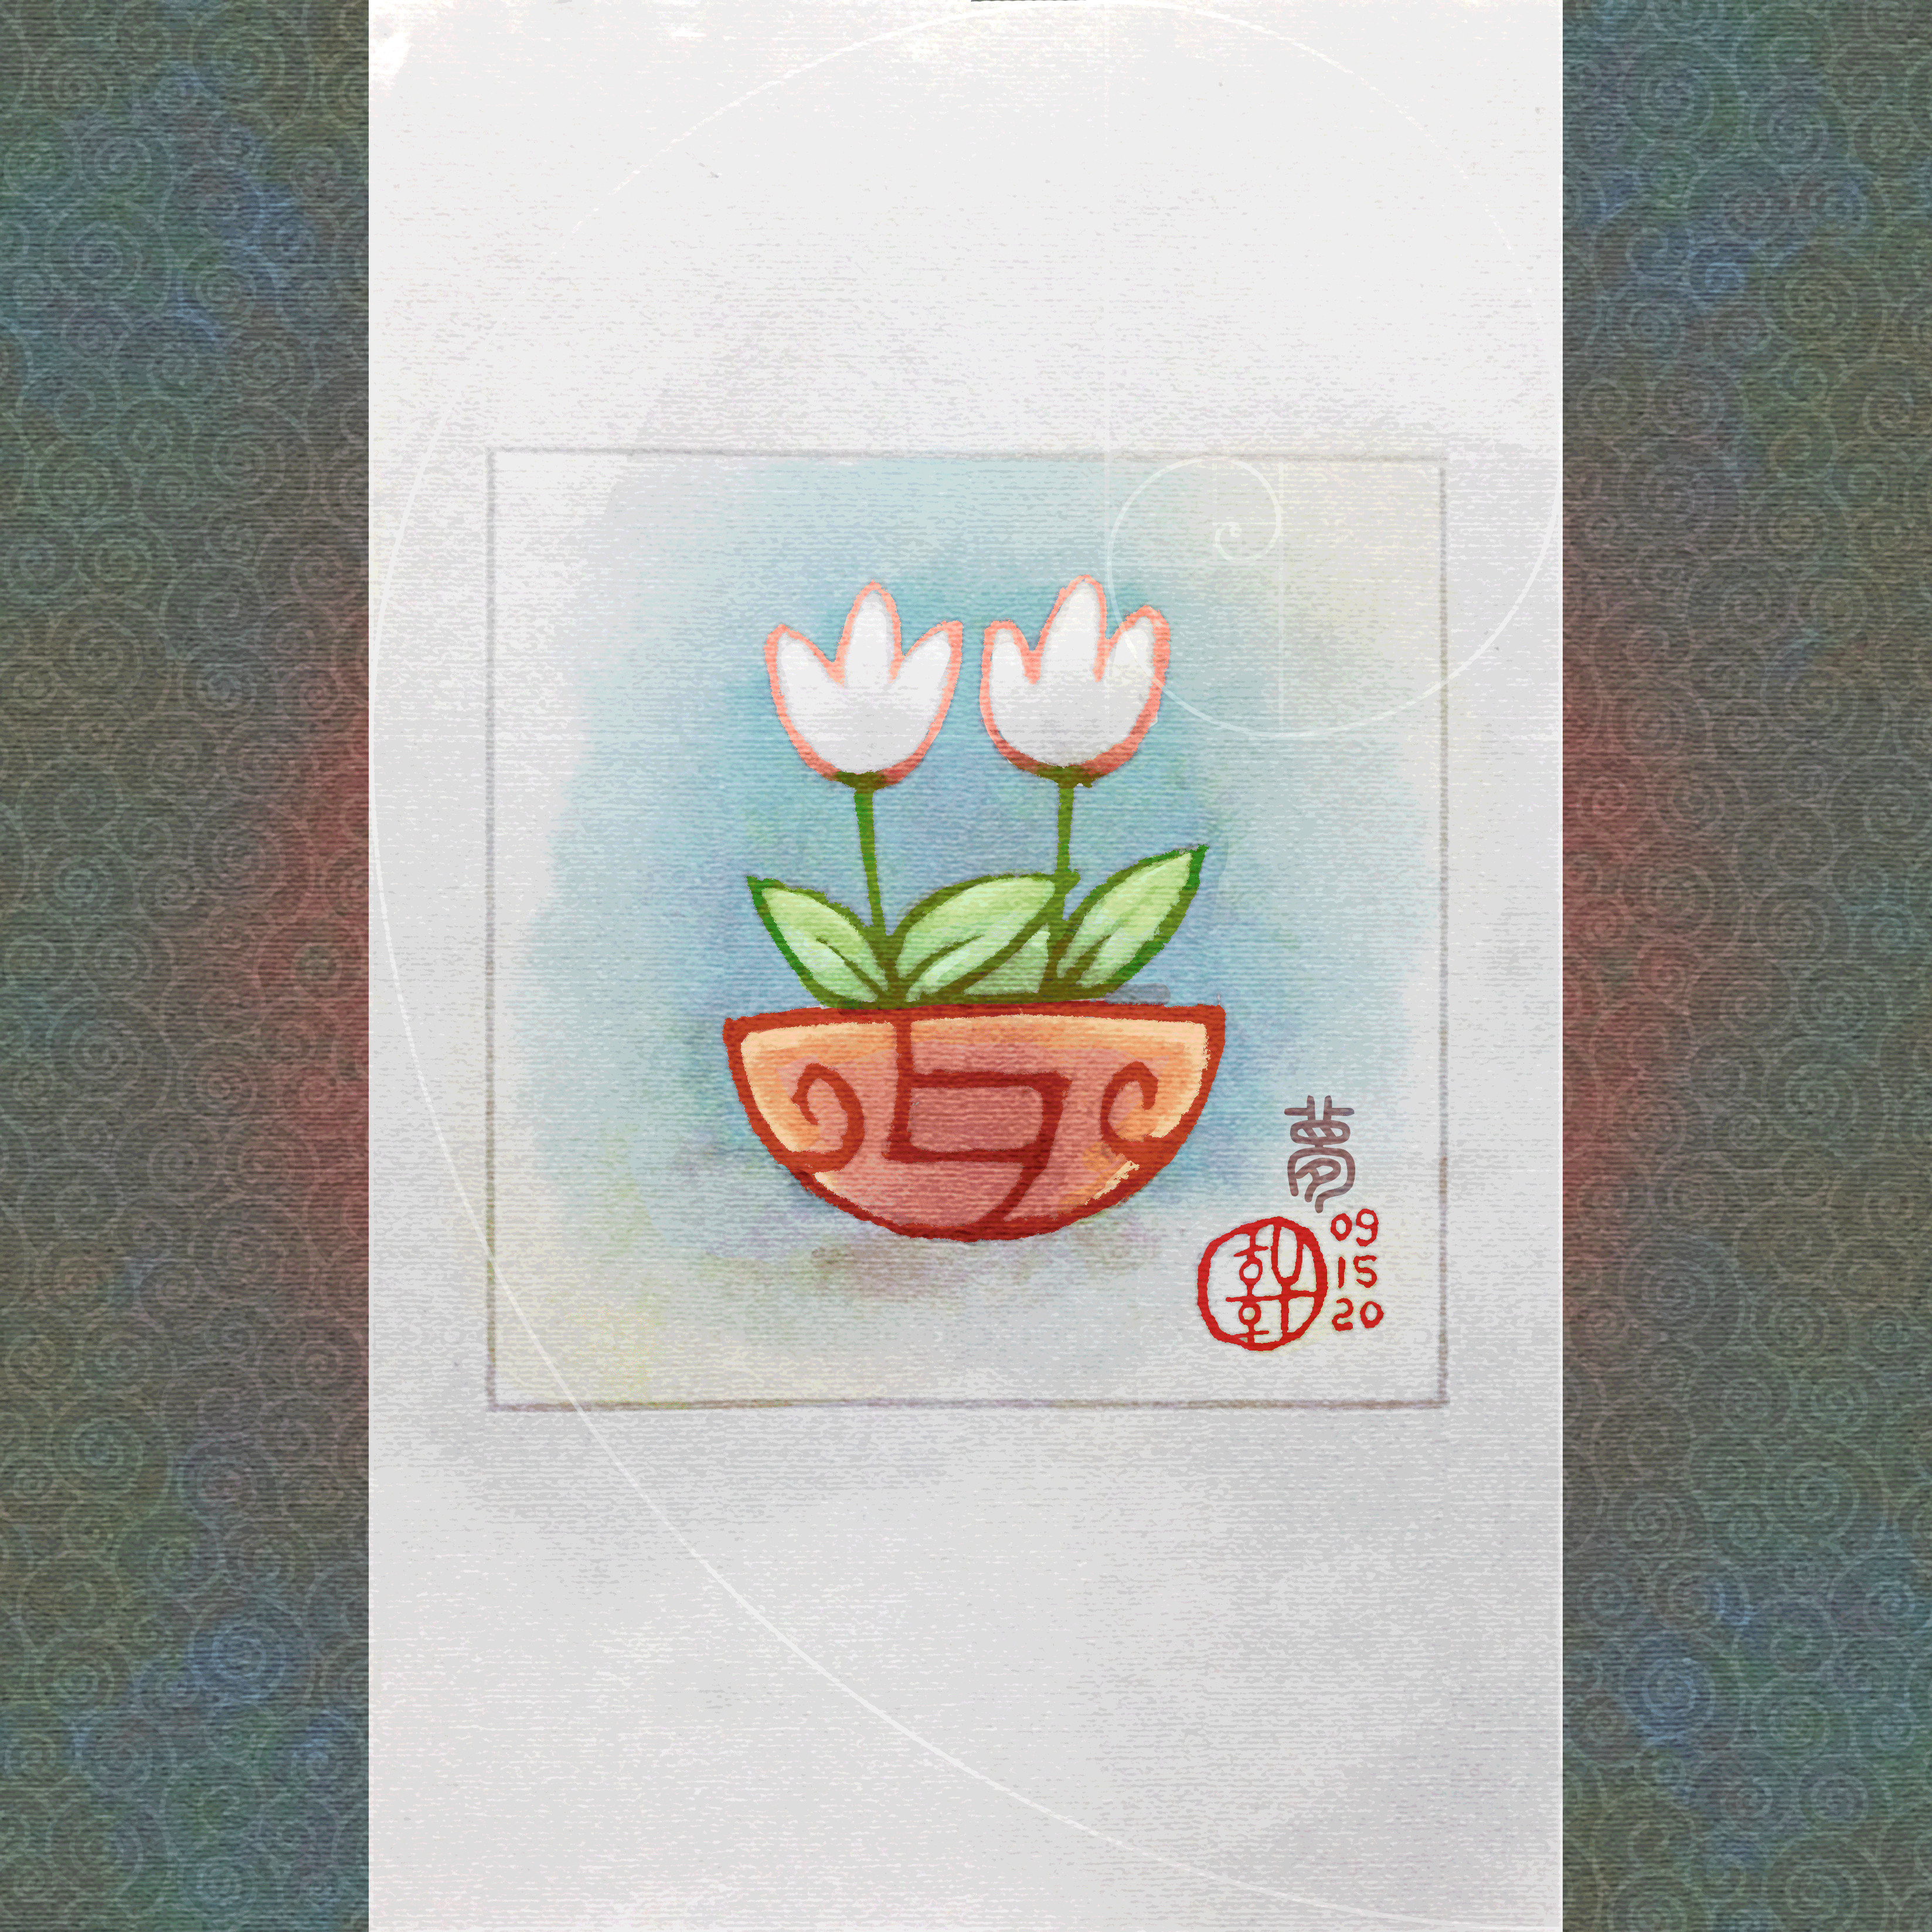 夢 Dream / Flowerpot